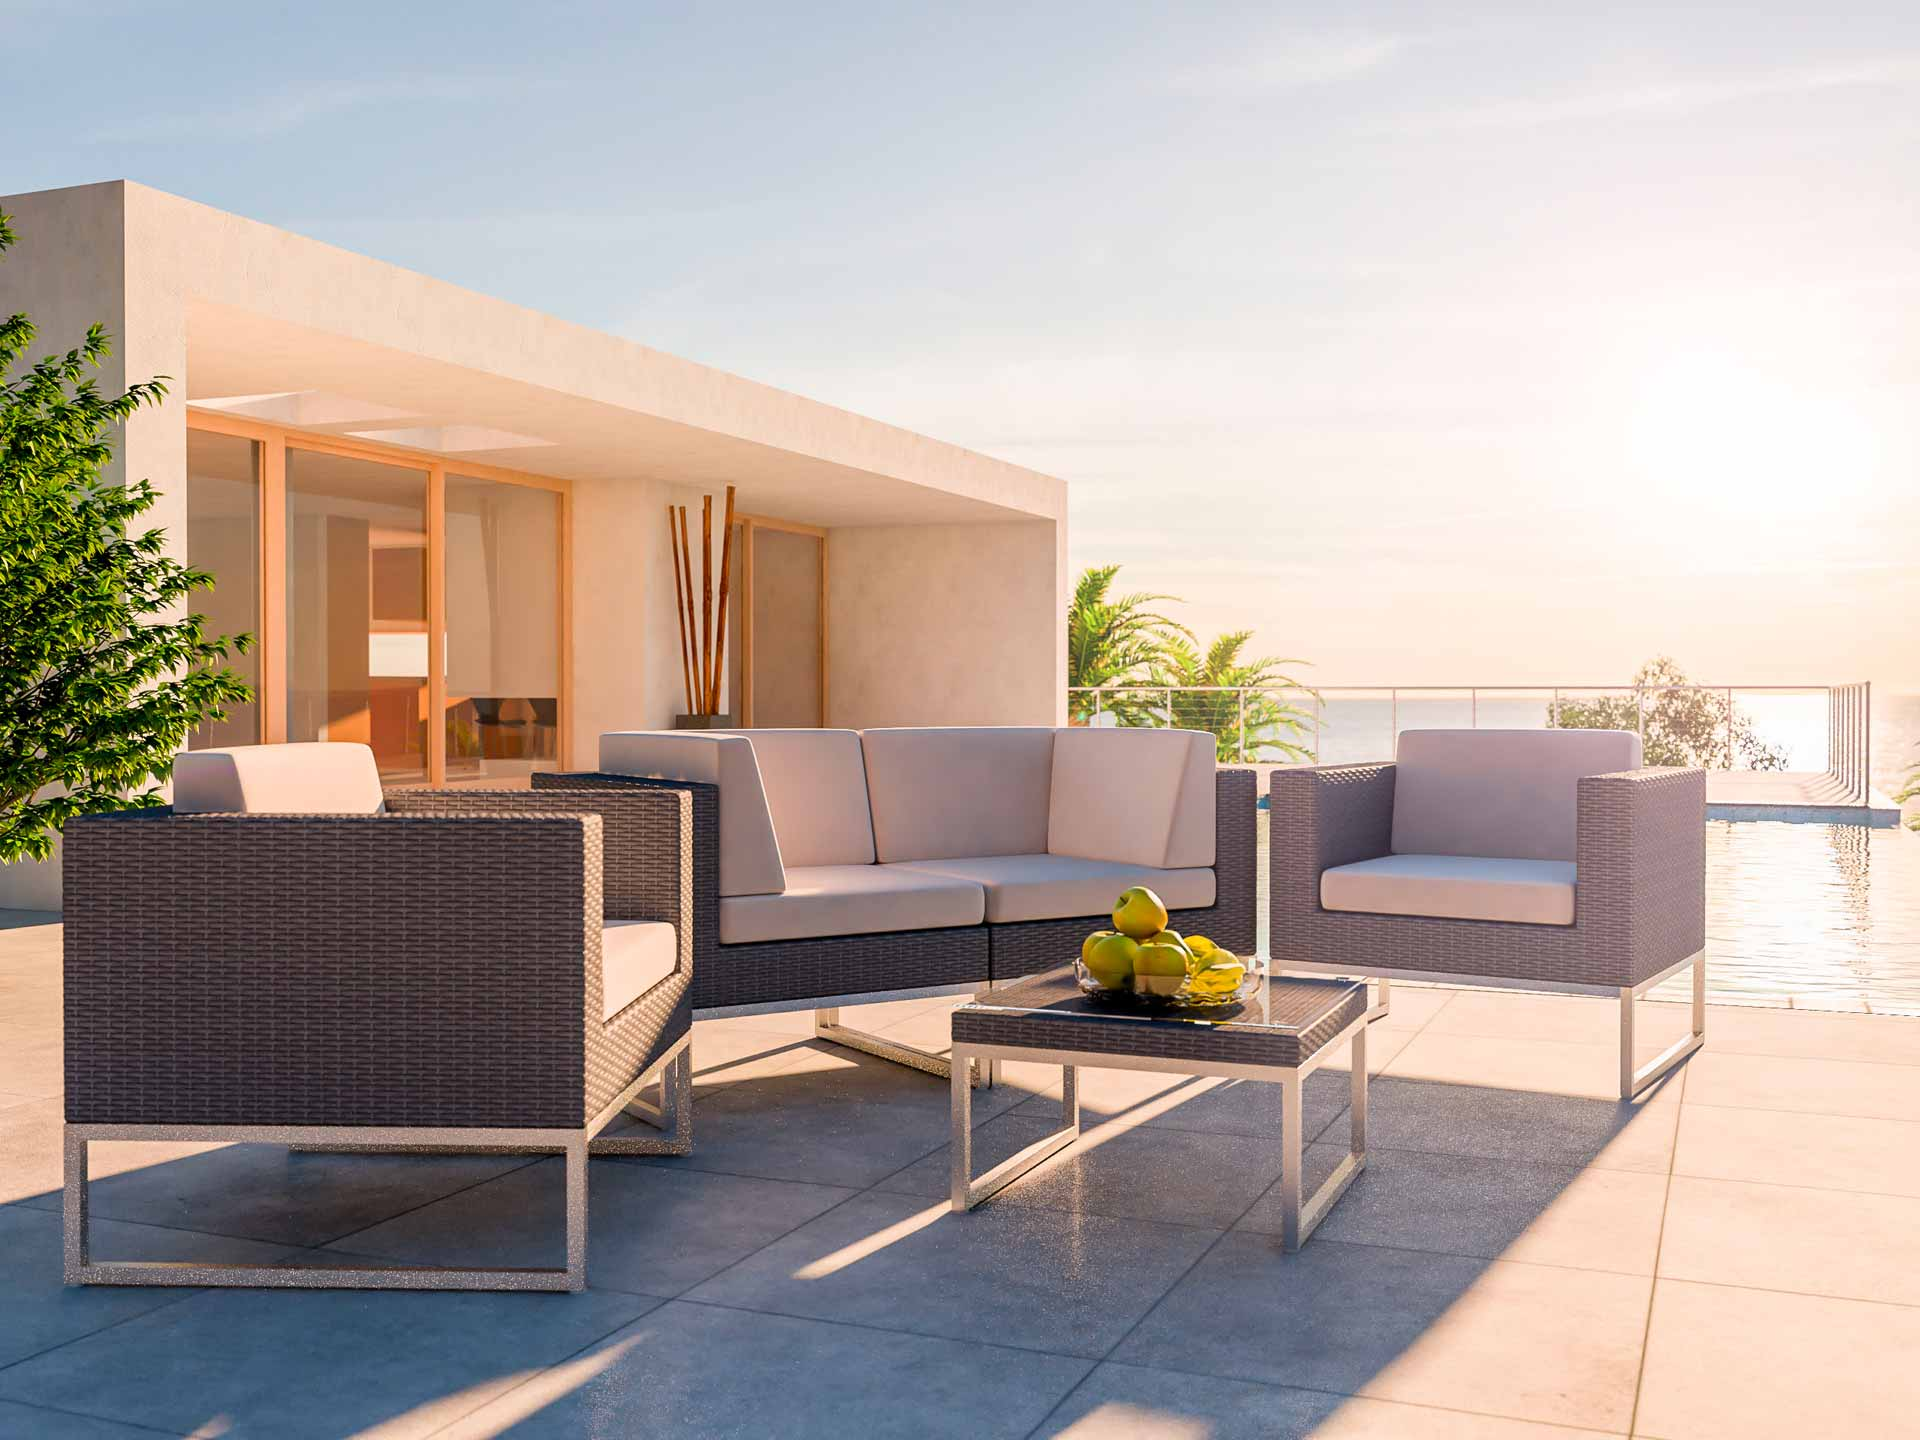 artelia polyrattan aluminium garnitur im lounge stil alivera s. Black Bedroom Furniture Sets. Home Design Ideas